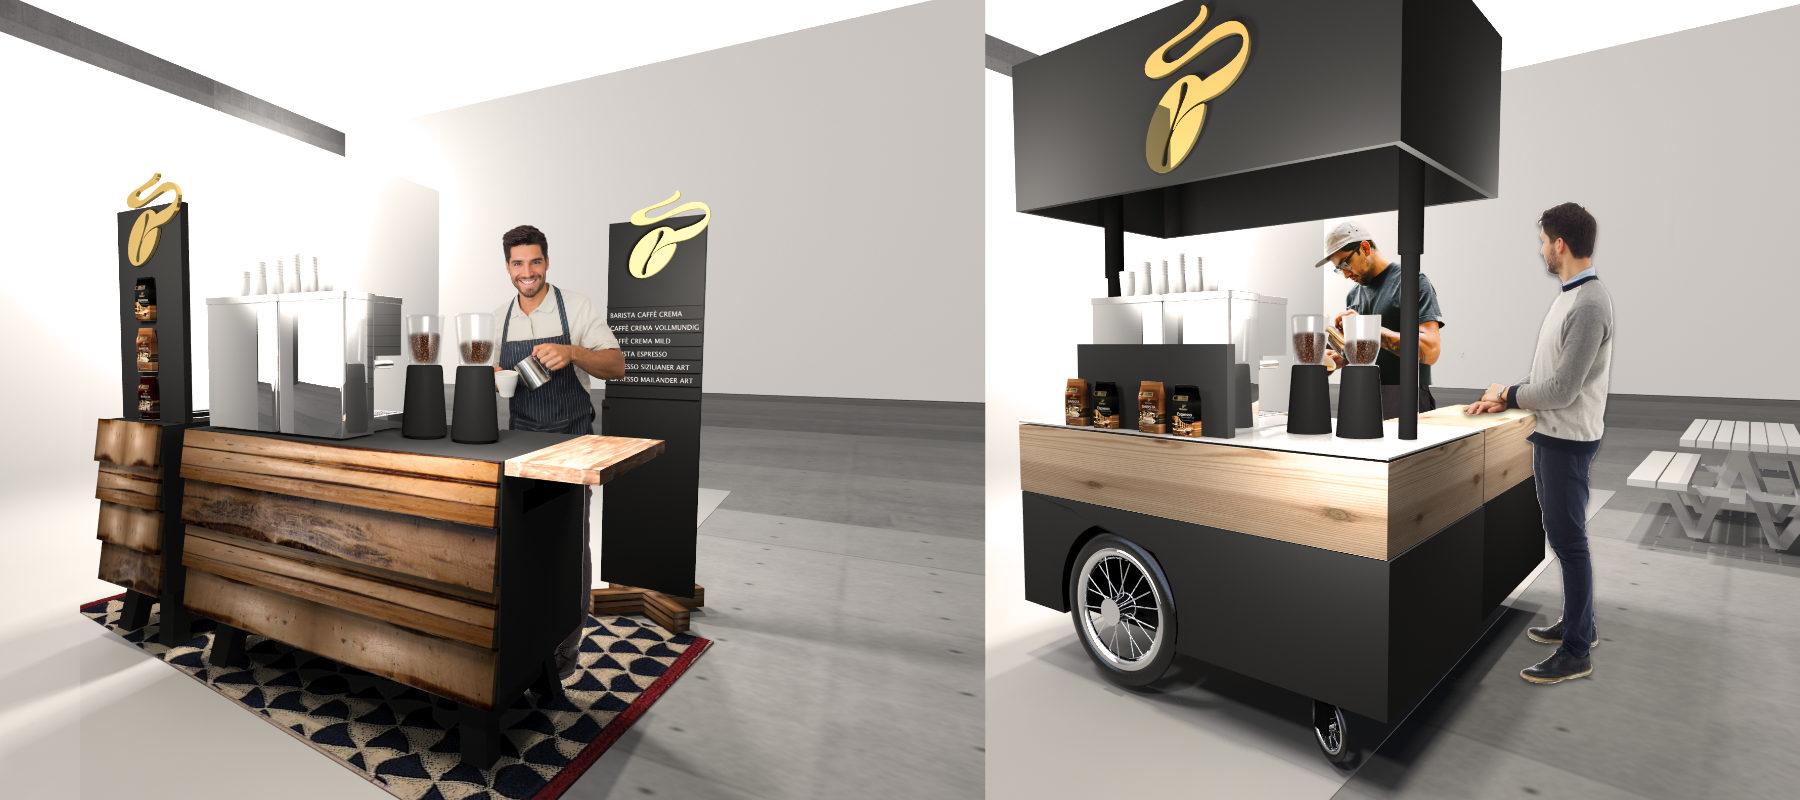 Gastronomie-Design mobile Catering Tresen